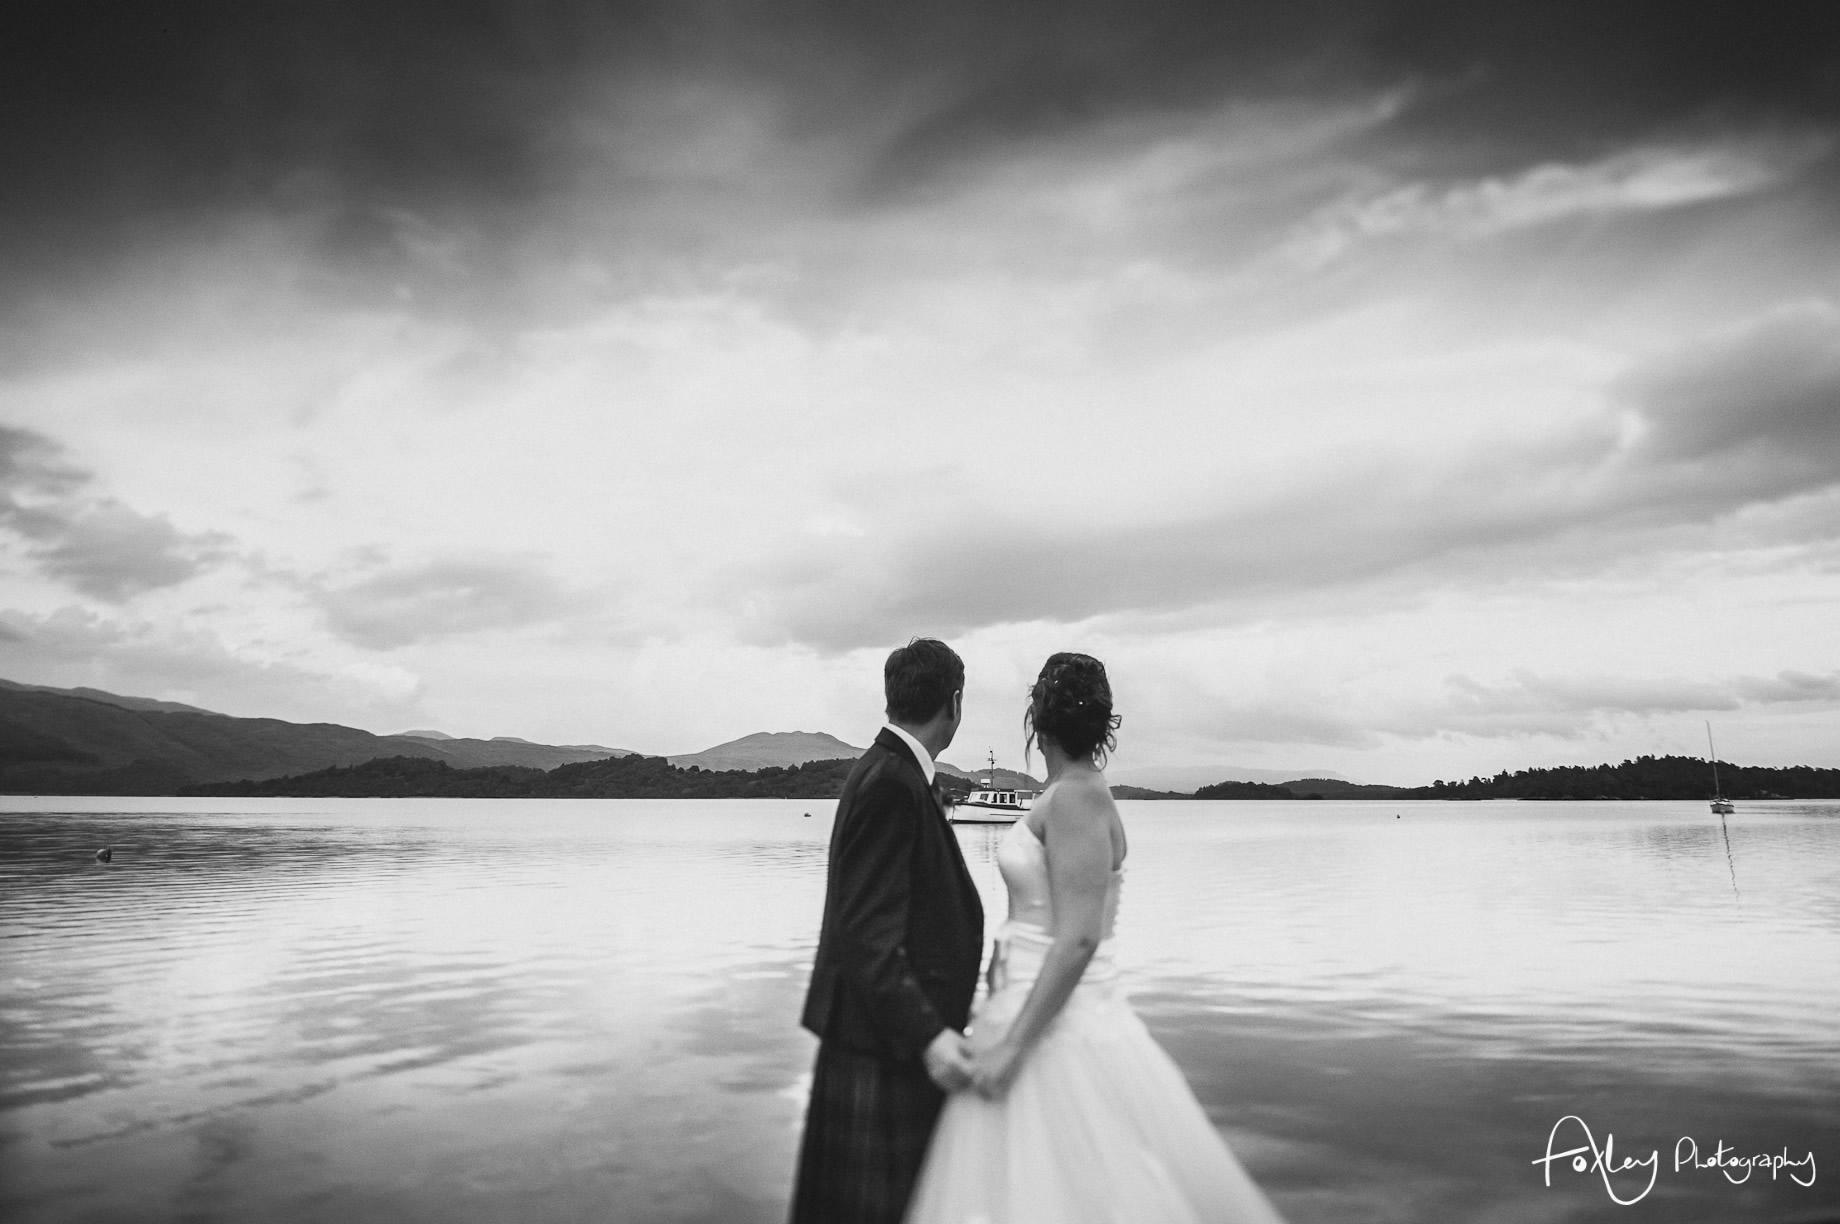 Alys-And-Davids-Wedding-Loch-Lomond-158